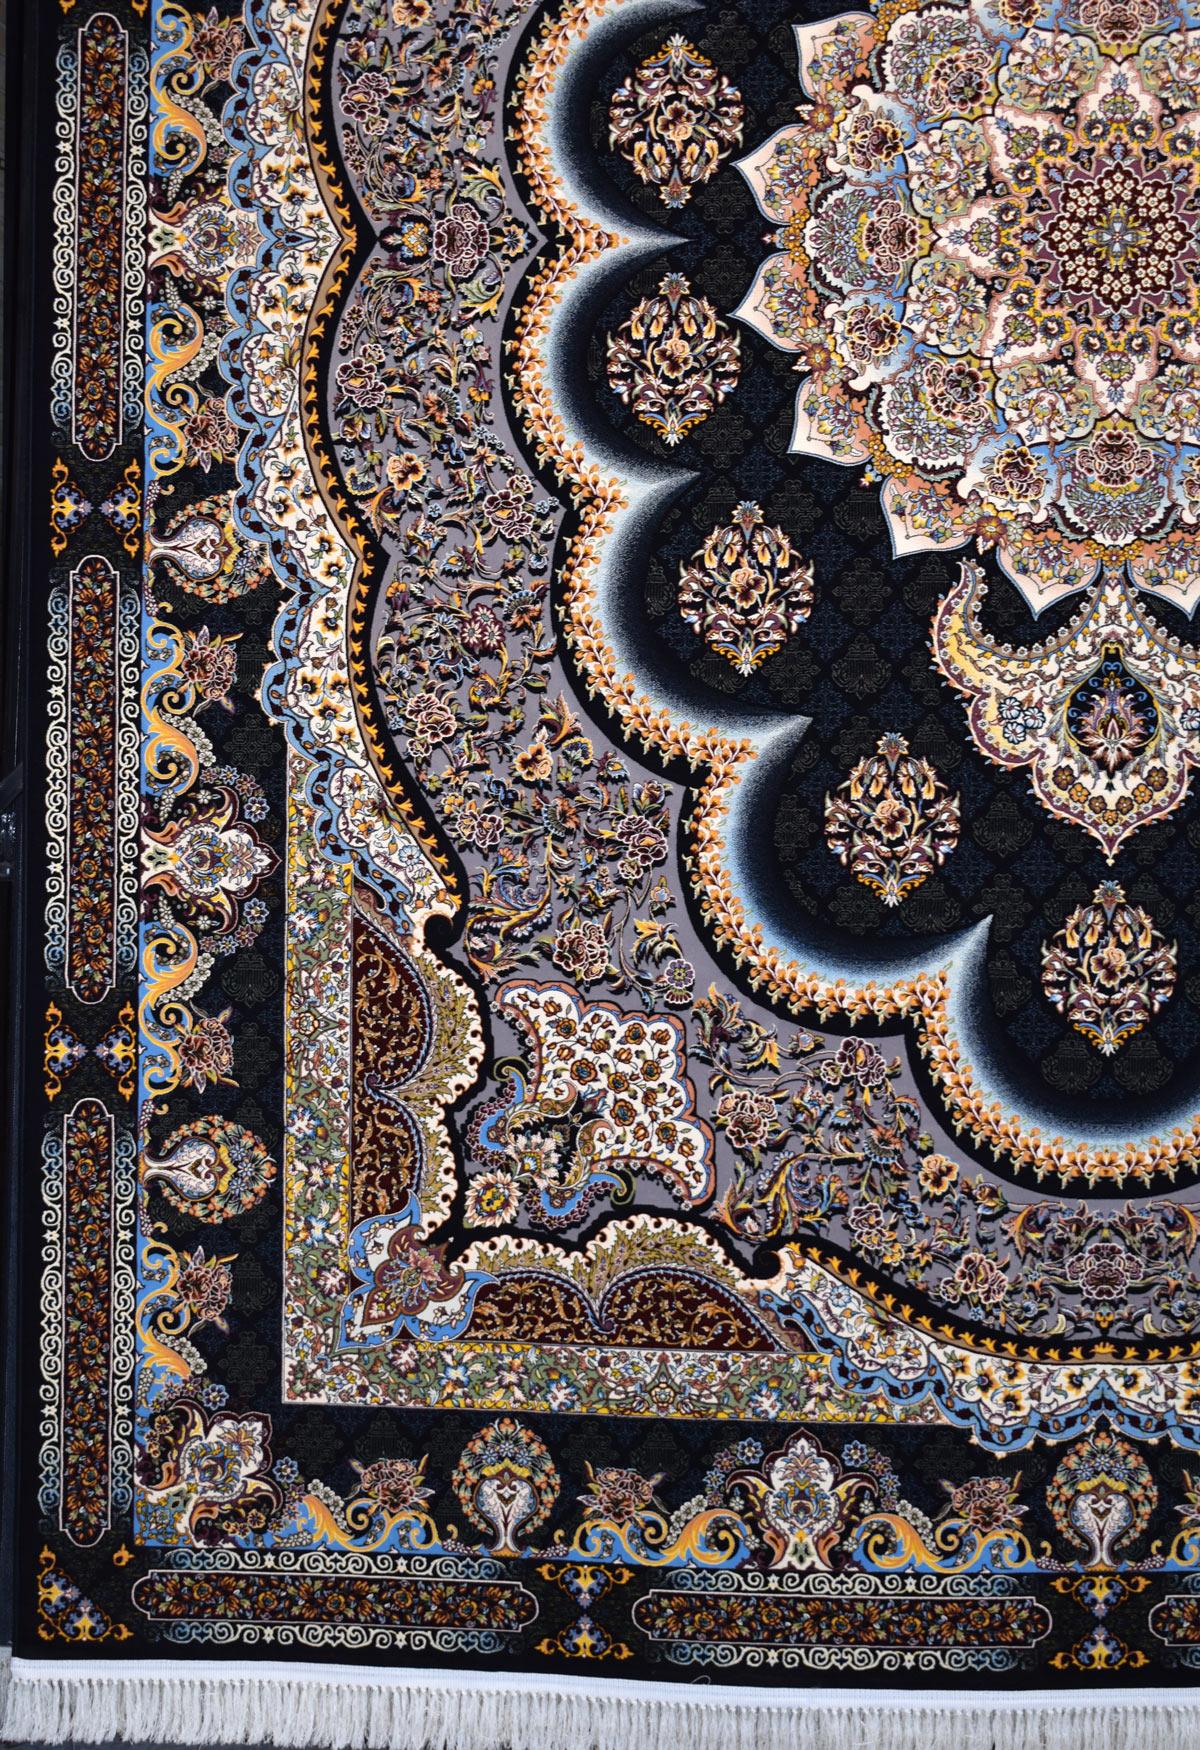 فرش ۱۲۰۰ شانه کاشان نقشه سامی